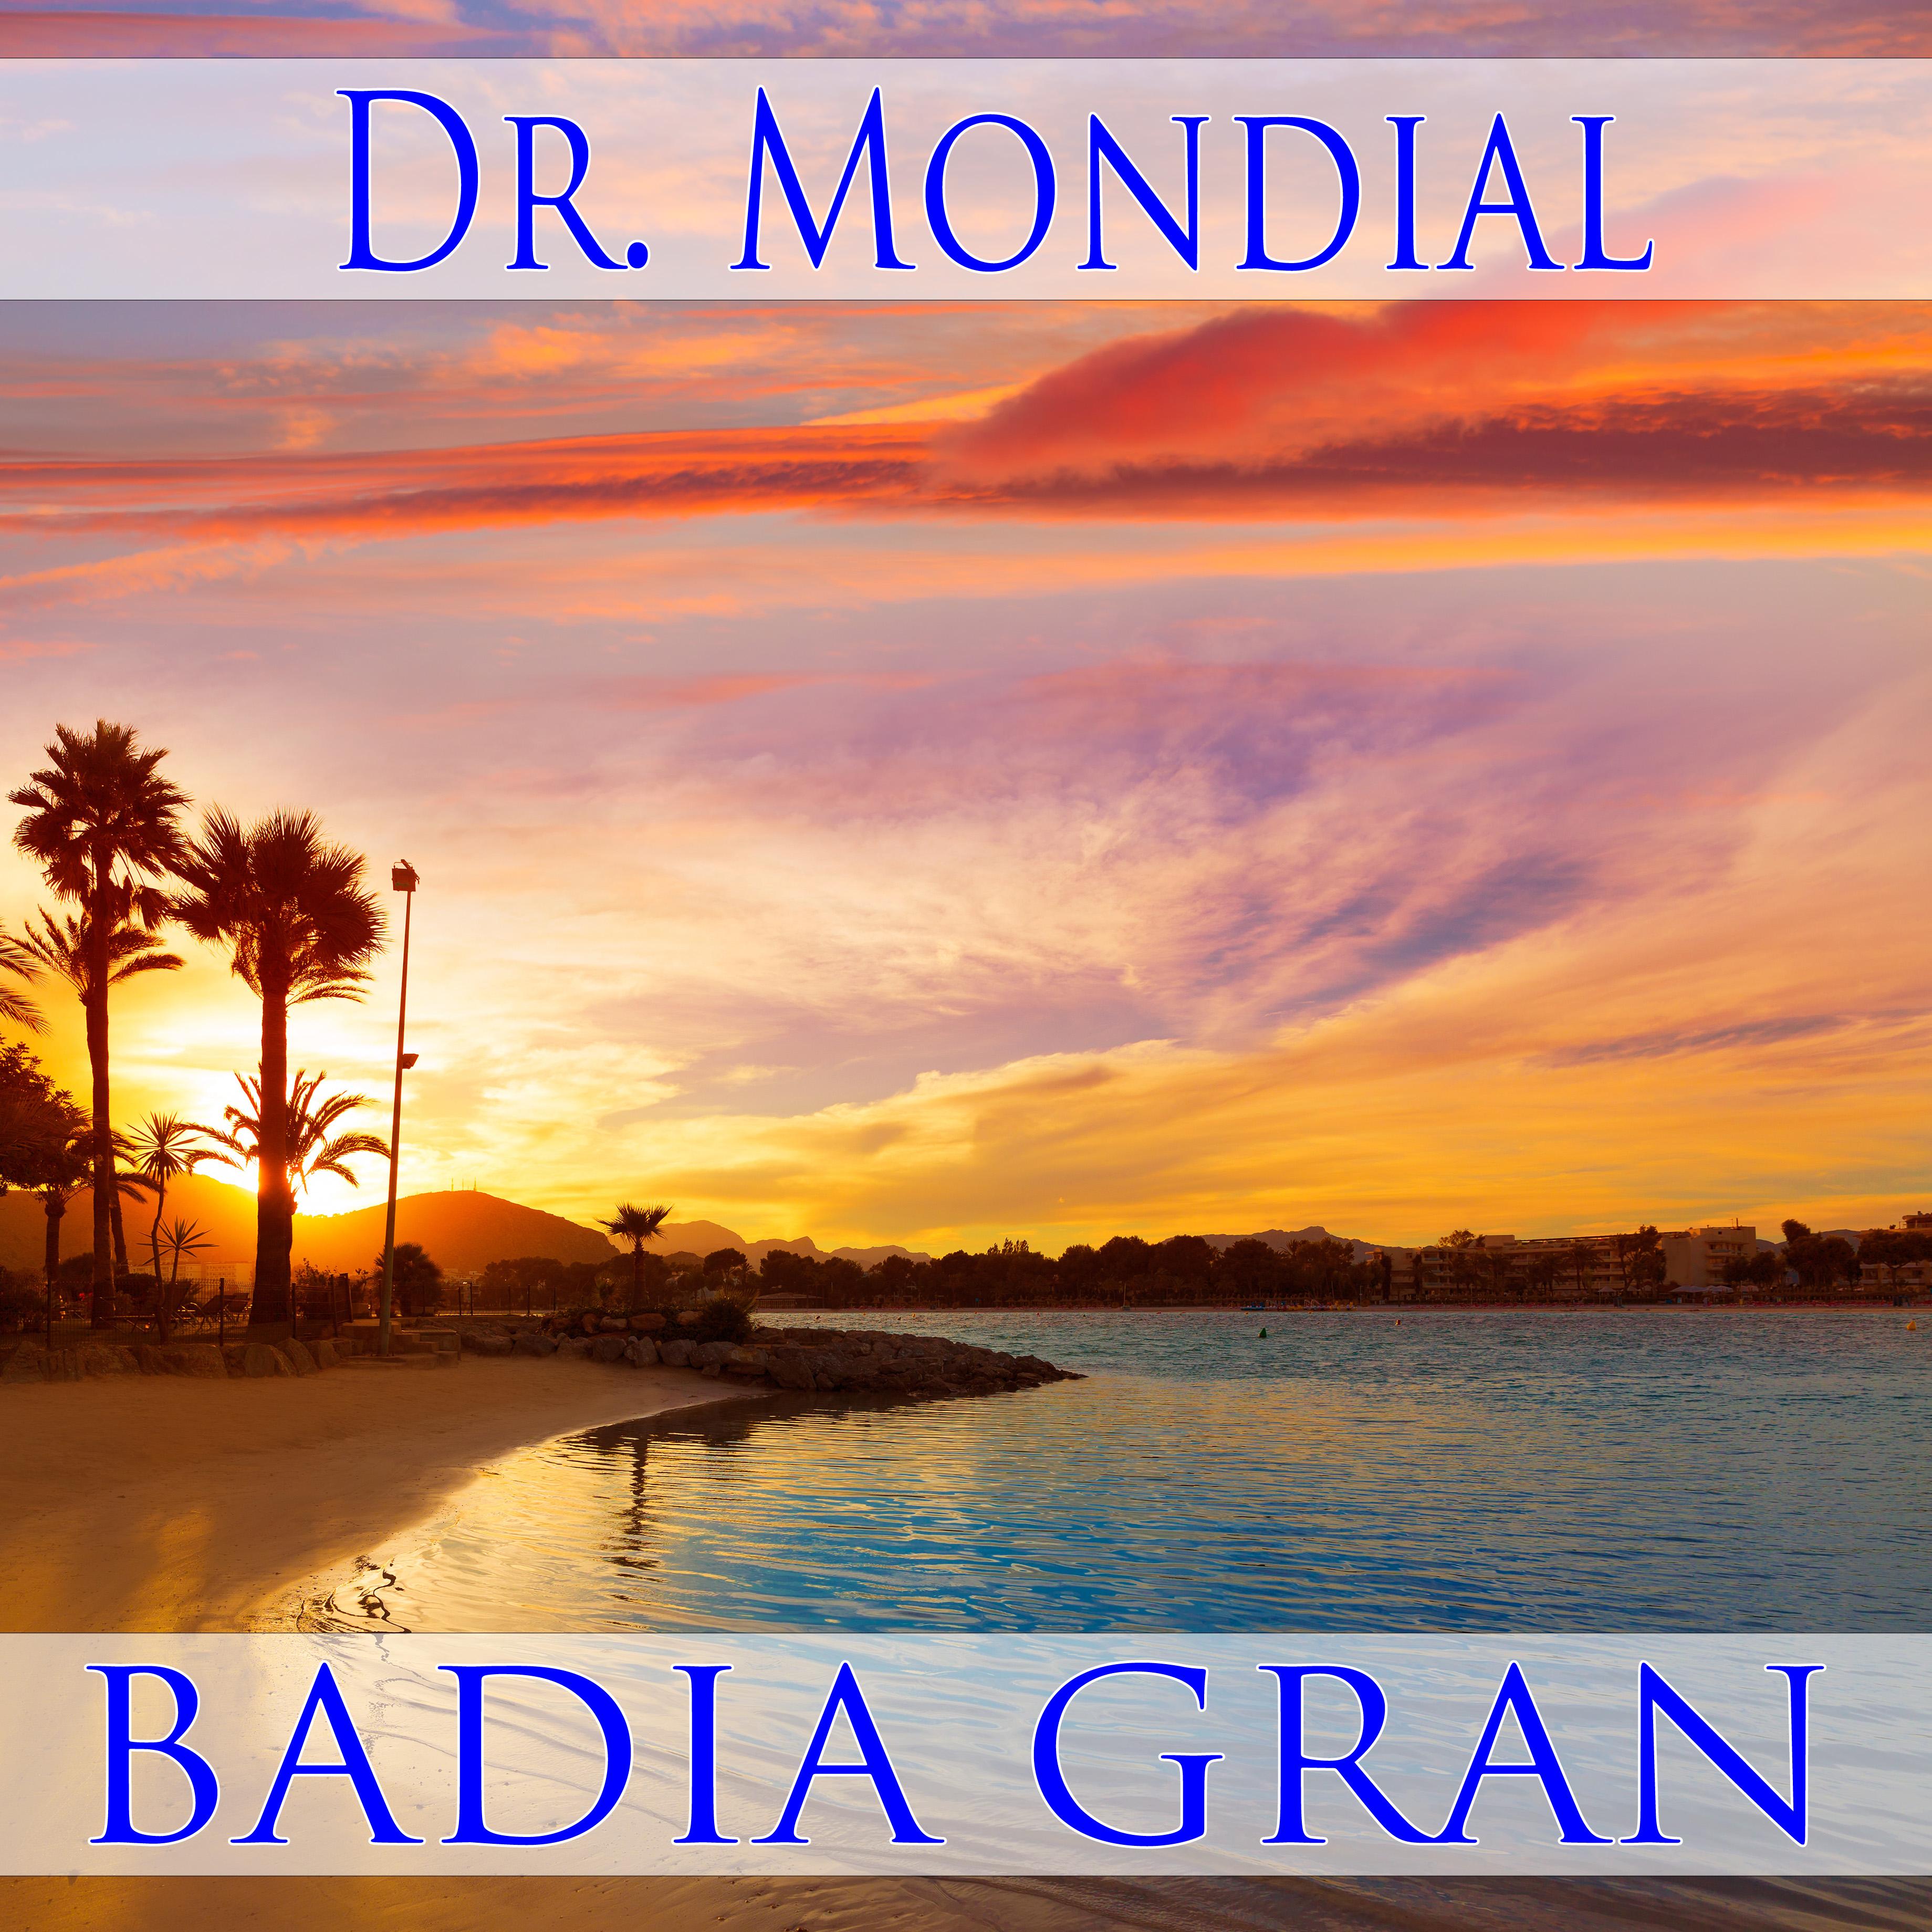 DR. MONDIAL-Badia Gran